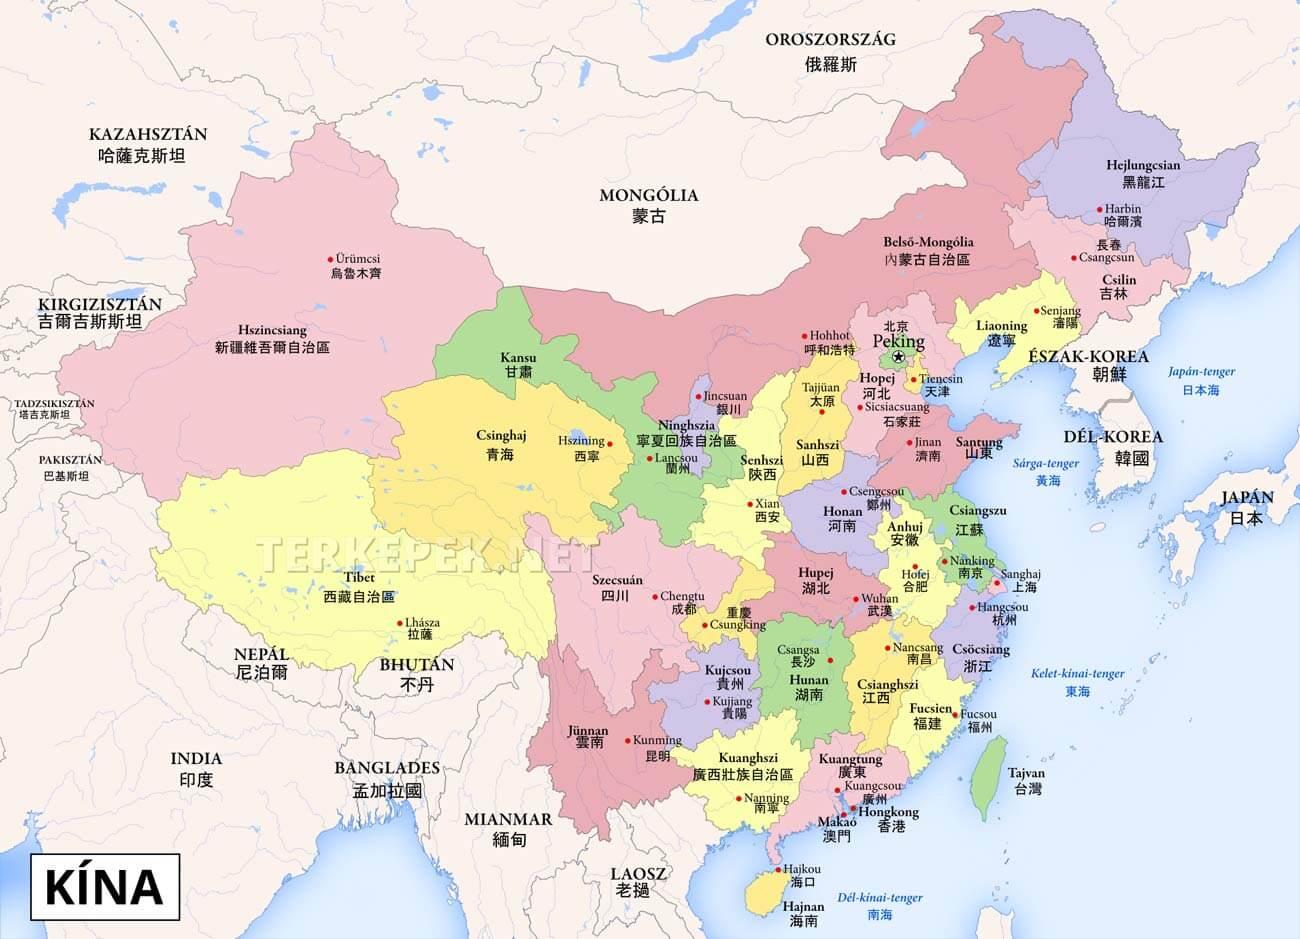 india domborzati térkép Kína domborzati térképe india domborzati térkép